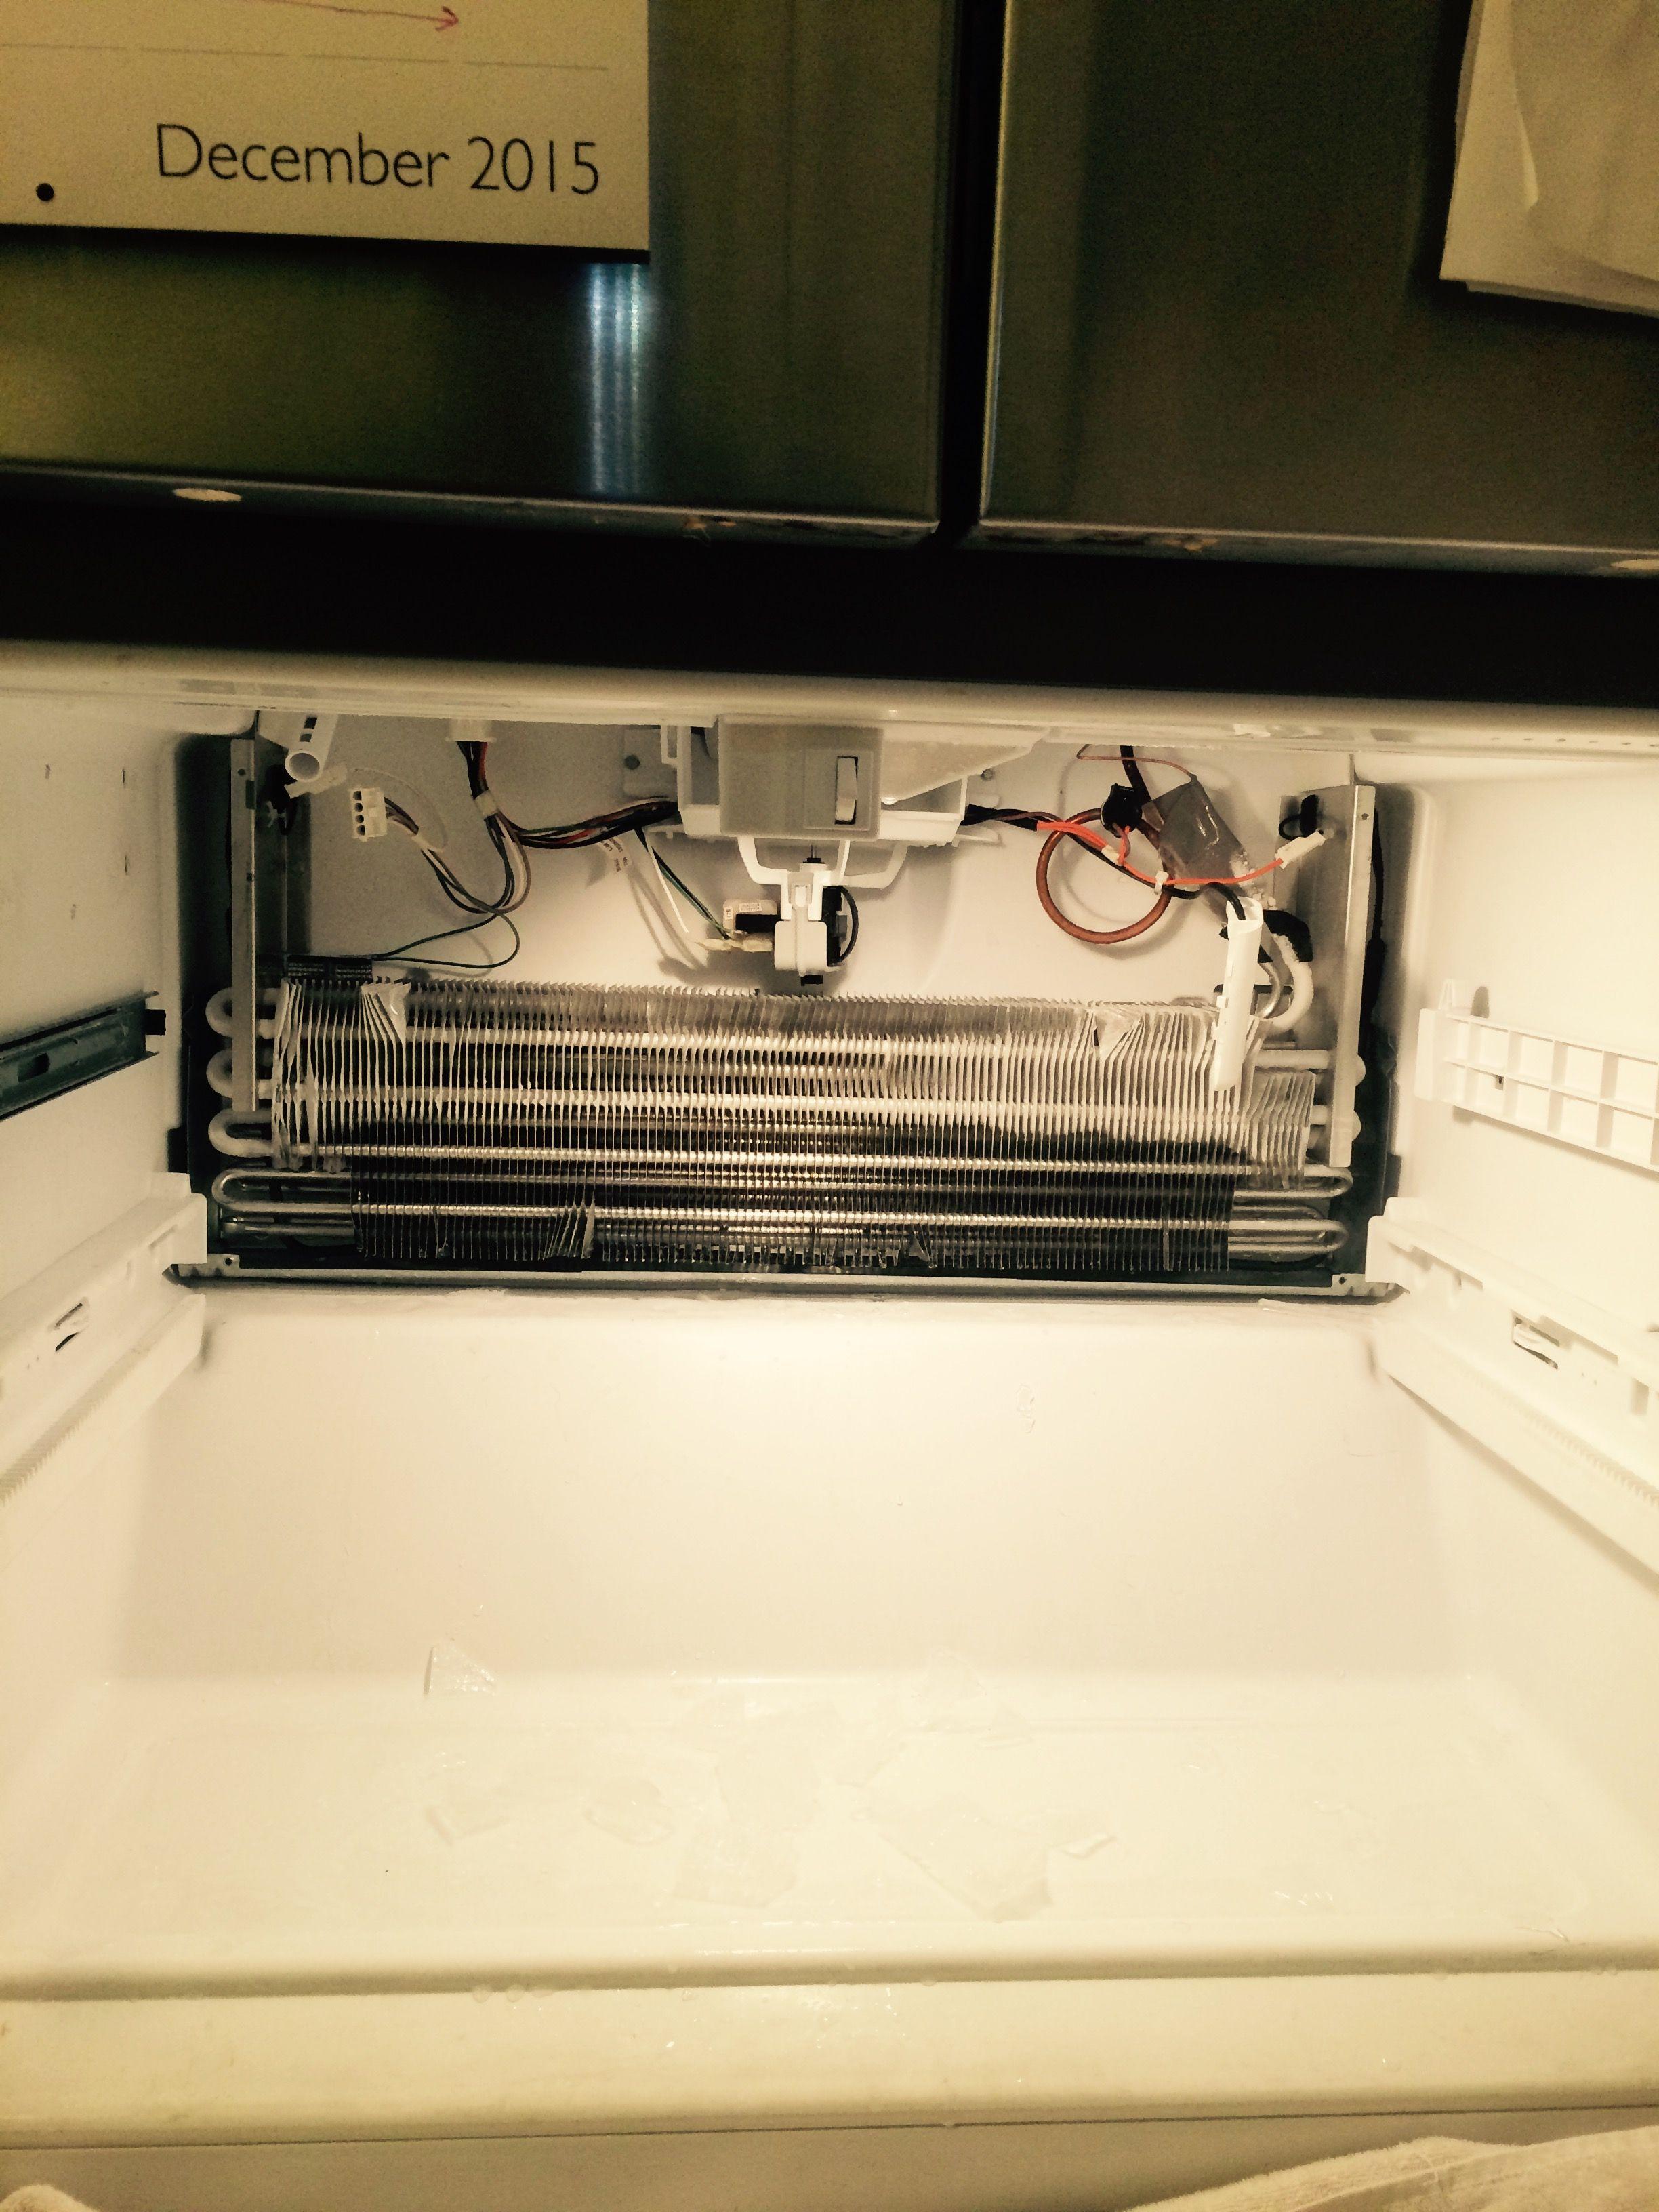 929 250 4328 Kitchen Aid Fridge Repair Kfcs22evms8 Fridge Repair Refrigerator Repair Kitchen Aid Fridge Repair Appliance Repair Refrigerator Repair